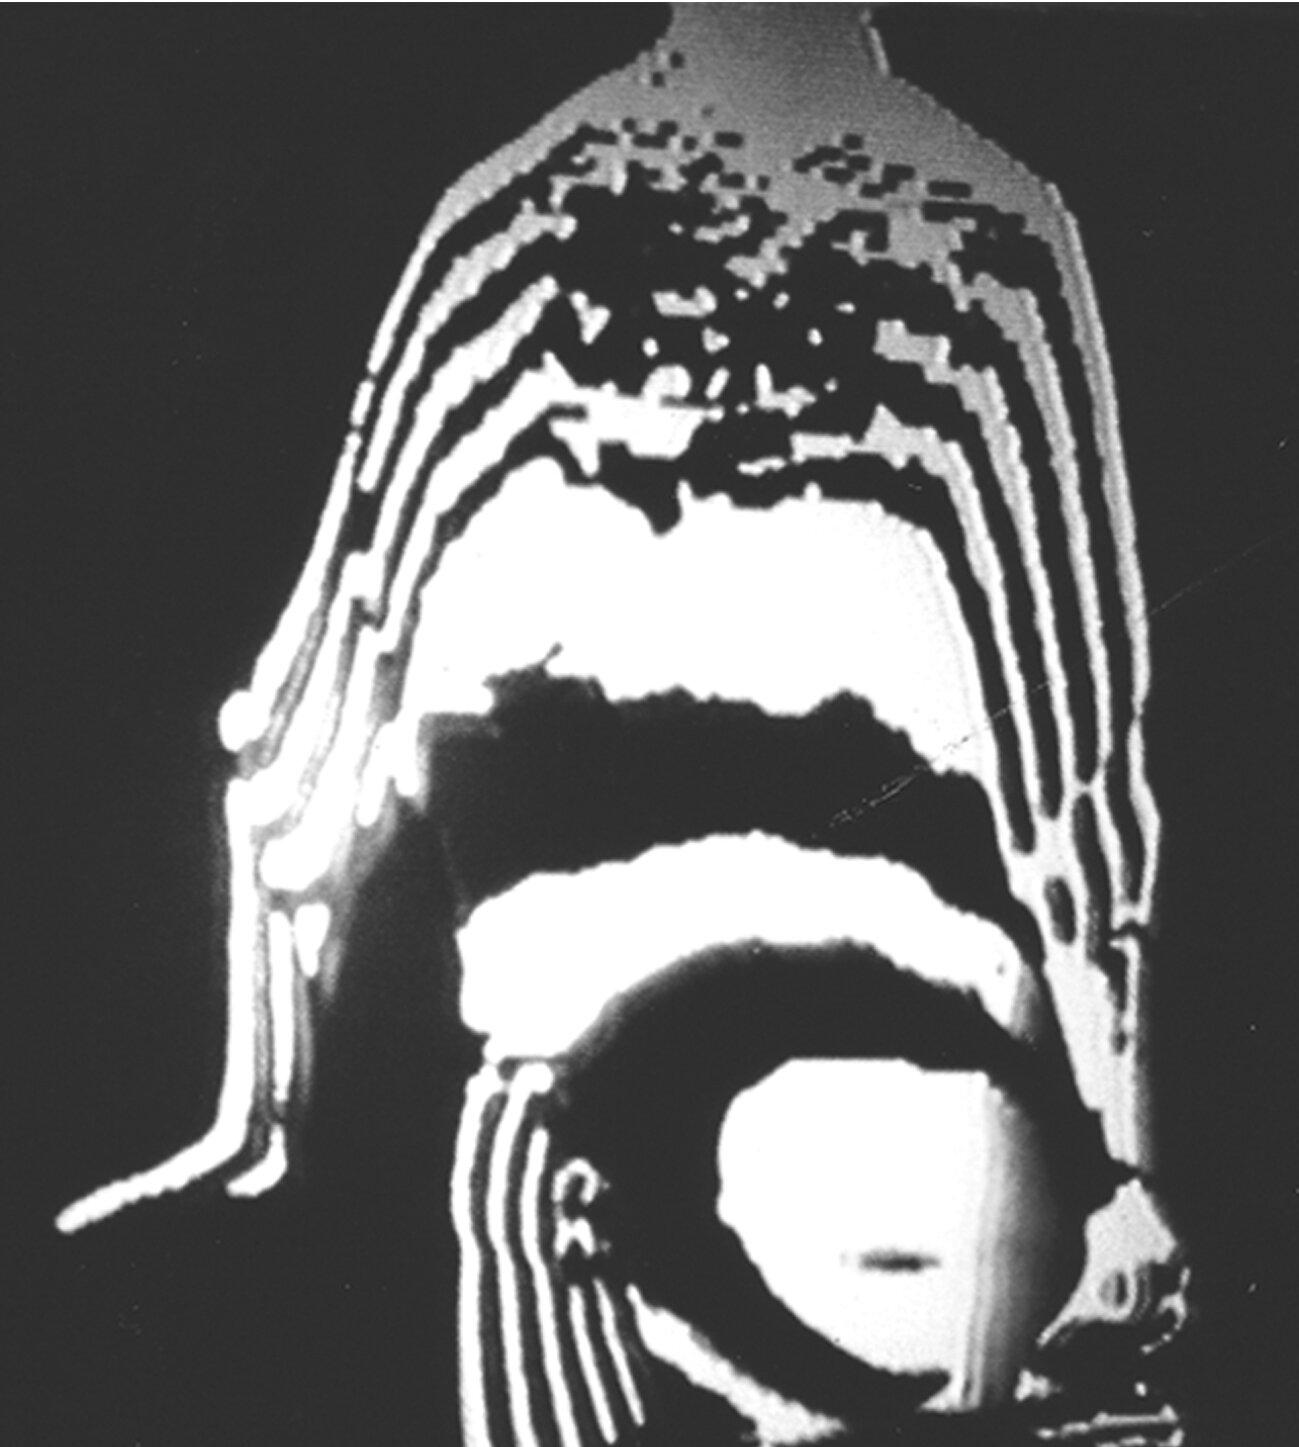 body-image-01.jpg